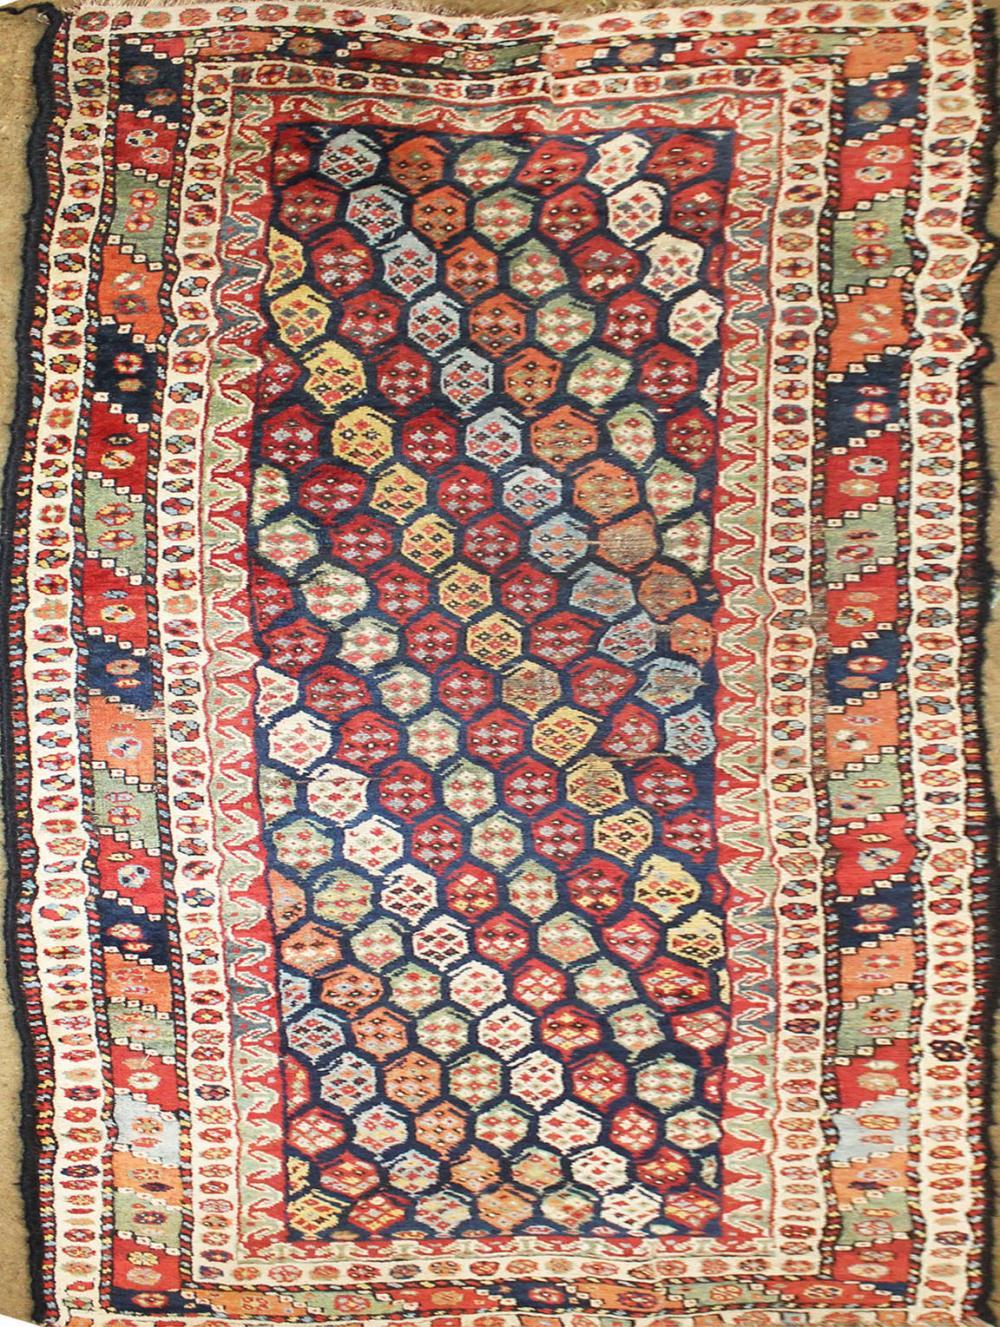 Caucasian Gendge or Karabagh area rug